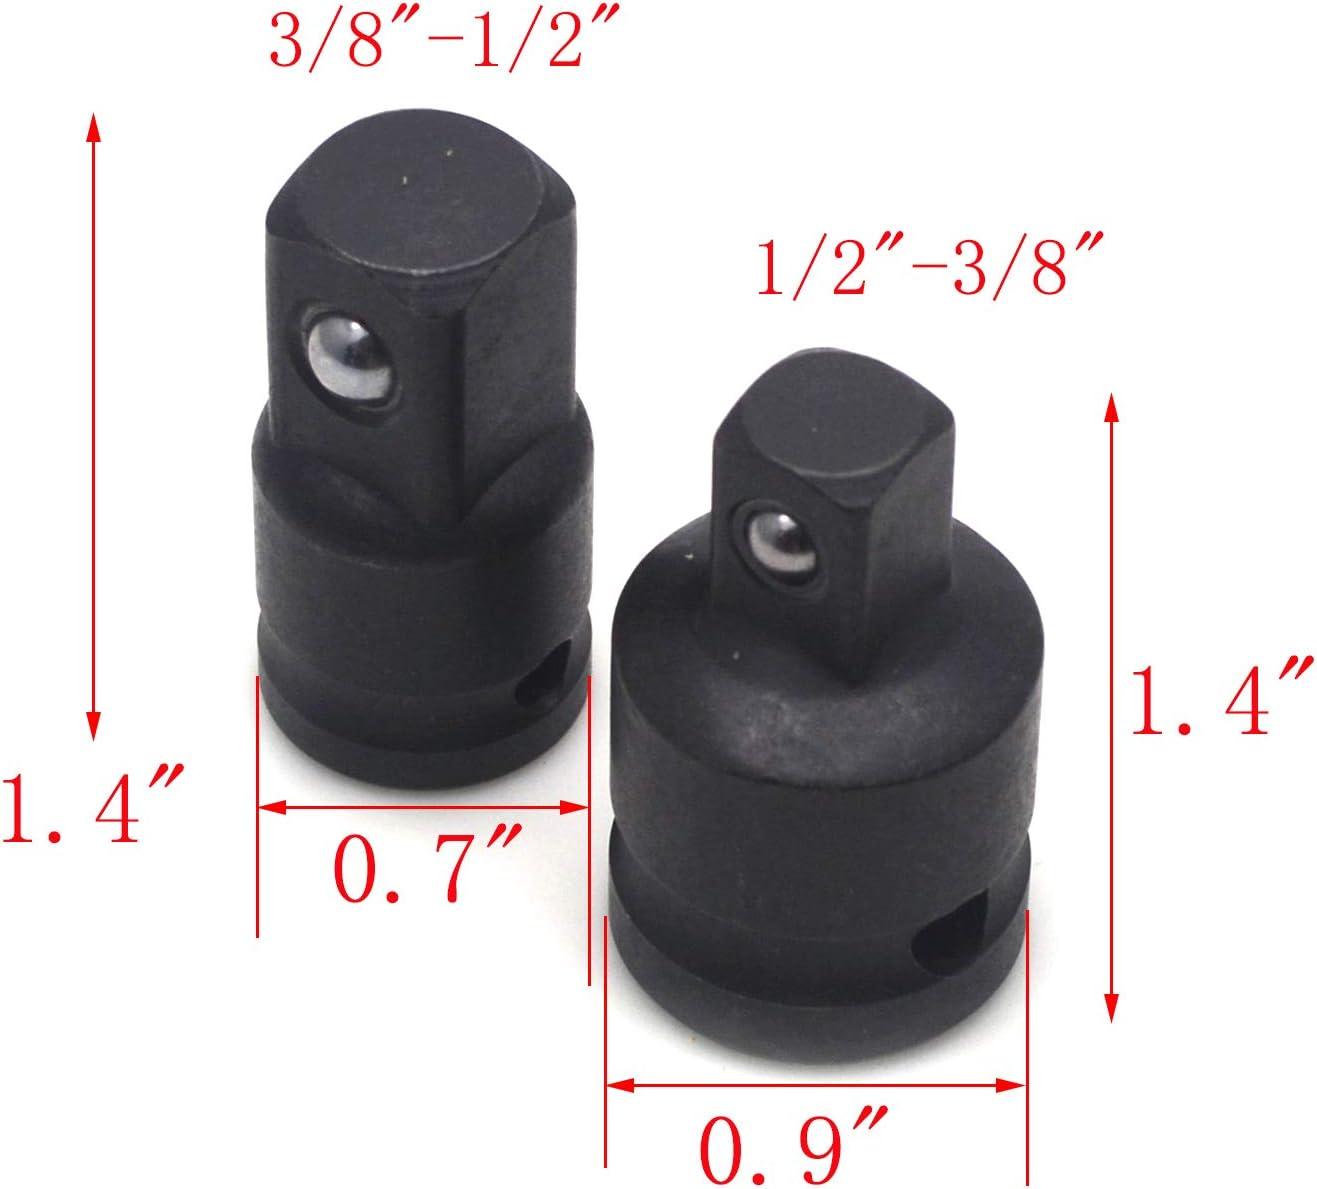 MTMTOOL 6 Piece Adapter and Reducer Set,1//4 3//8 1//2 Chrome Vanadium Steel Drive Socket Adapter Impact Adapter,Silver Tone